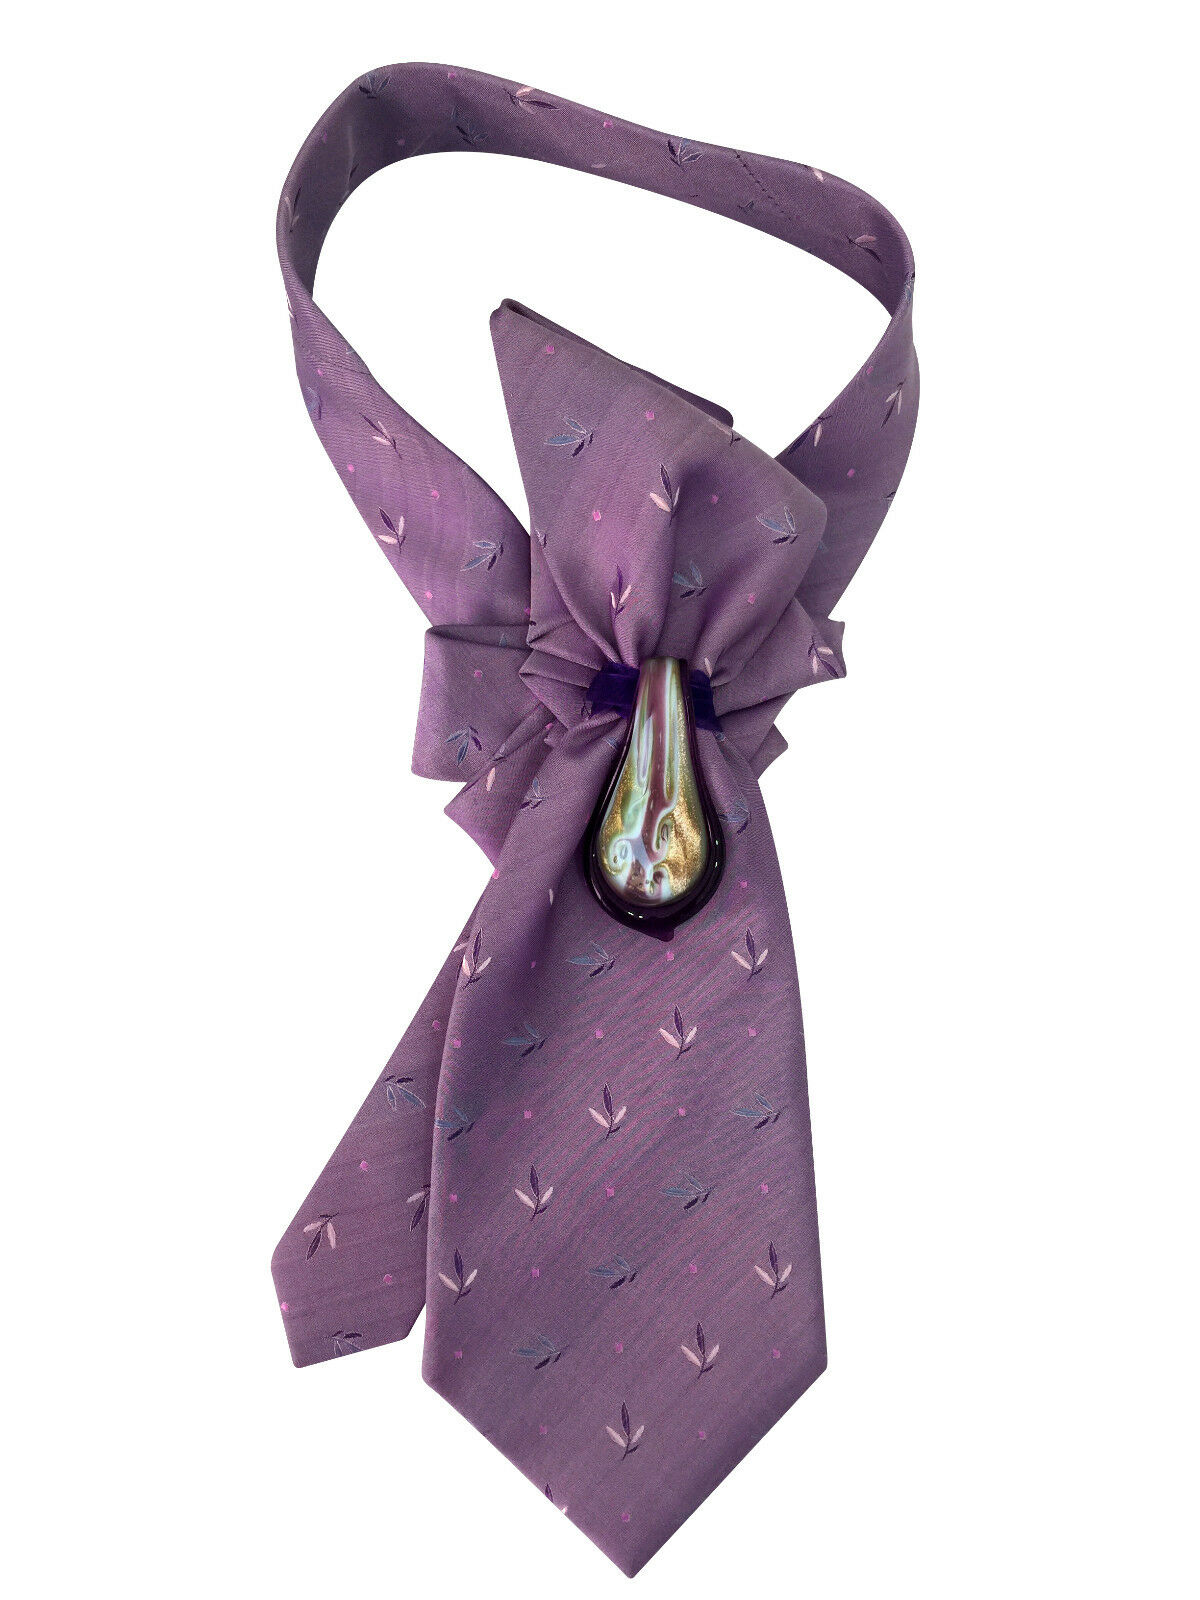 Sales -20% Tie women's. Silk 100% Italy, Murano glass. Collar, necklace, necktie